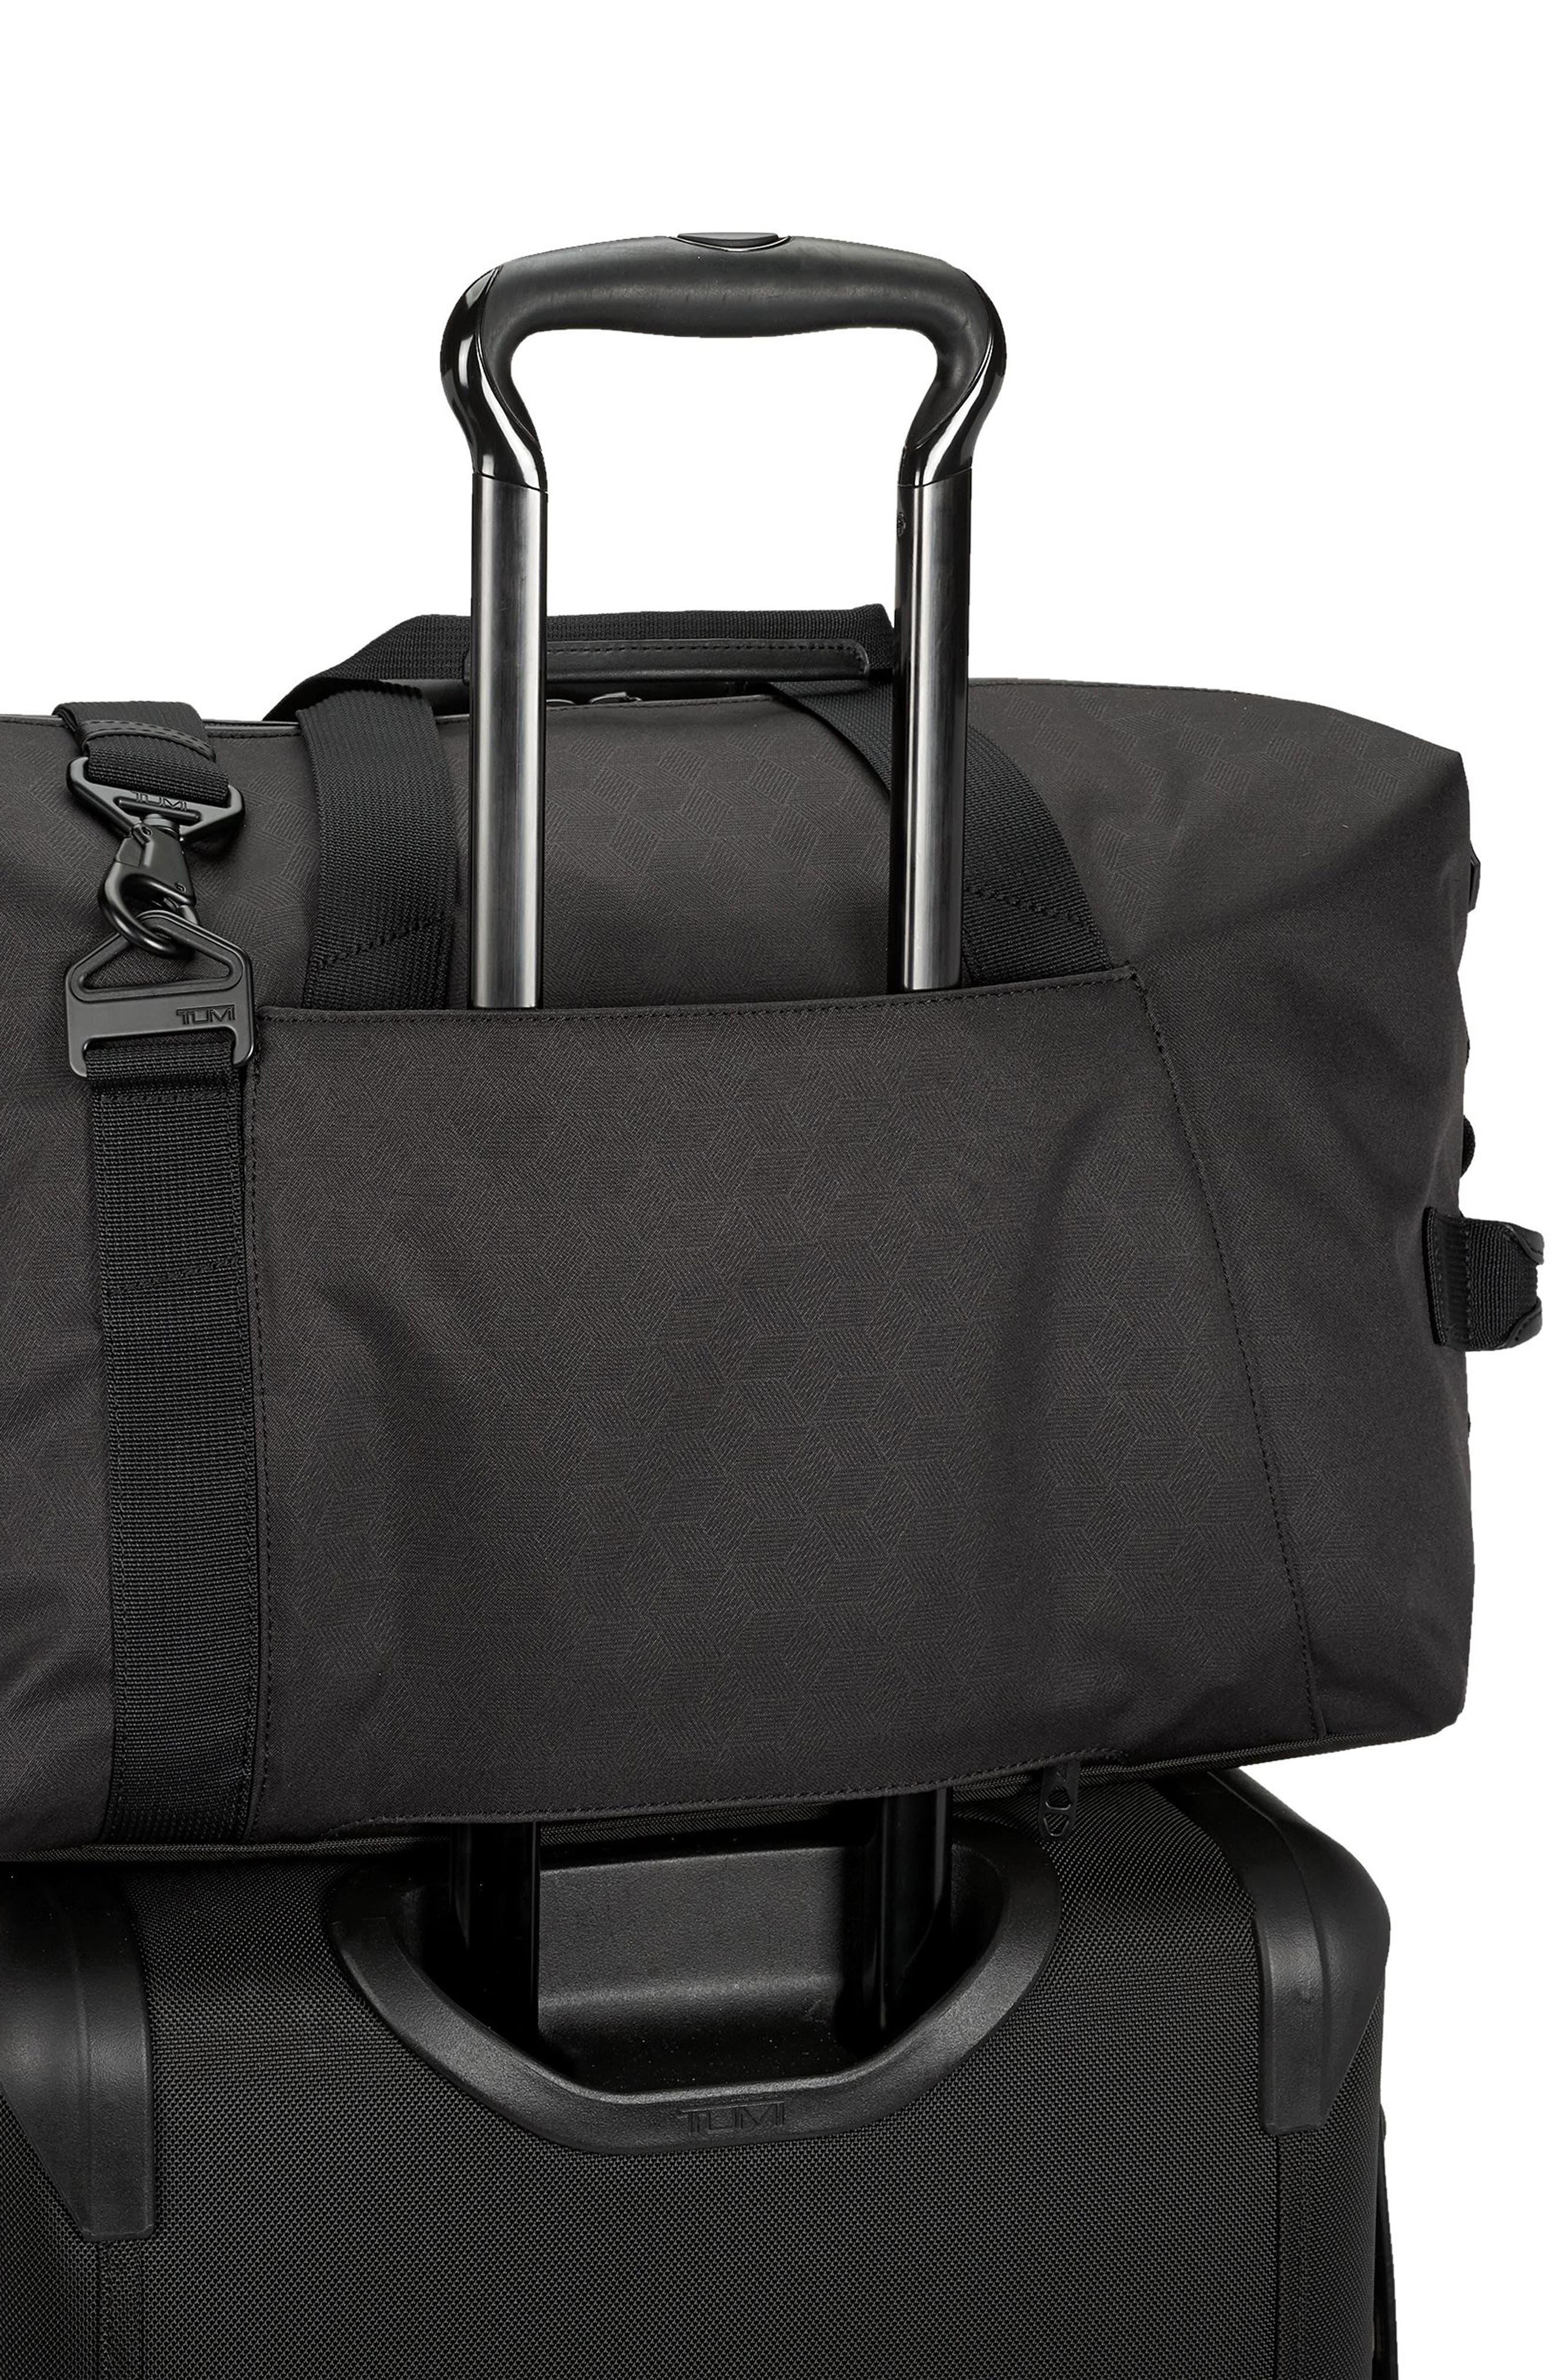 Sonoma Duffel Bag,                             Alternate thumbnail 5, color,                             BLACK